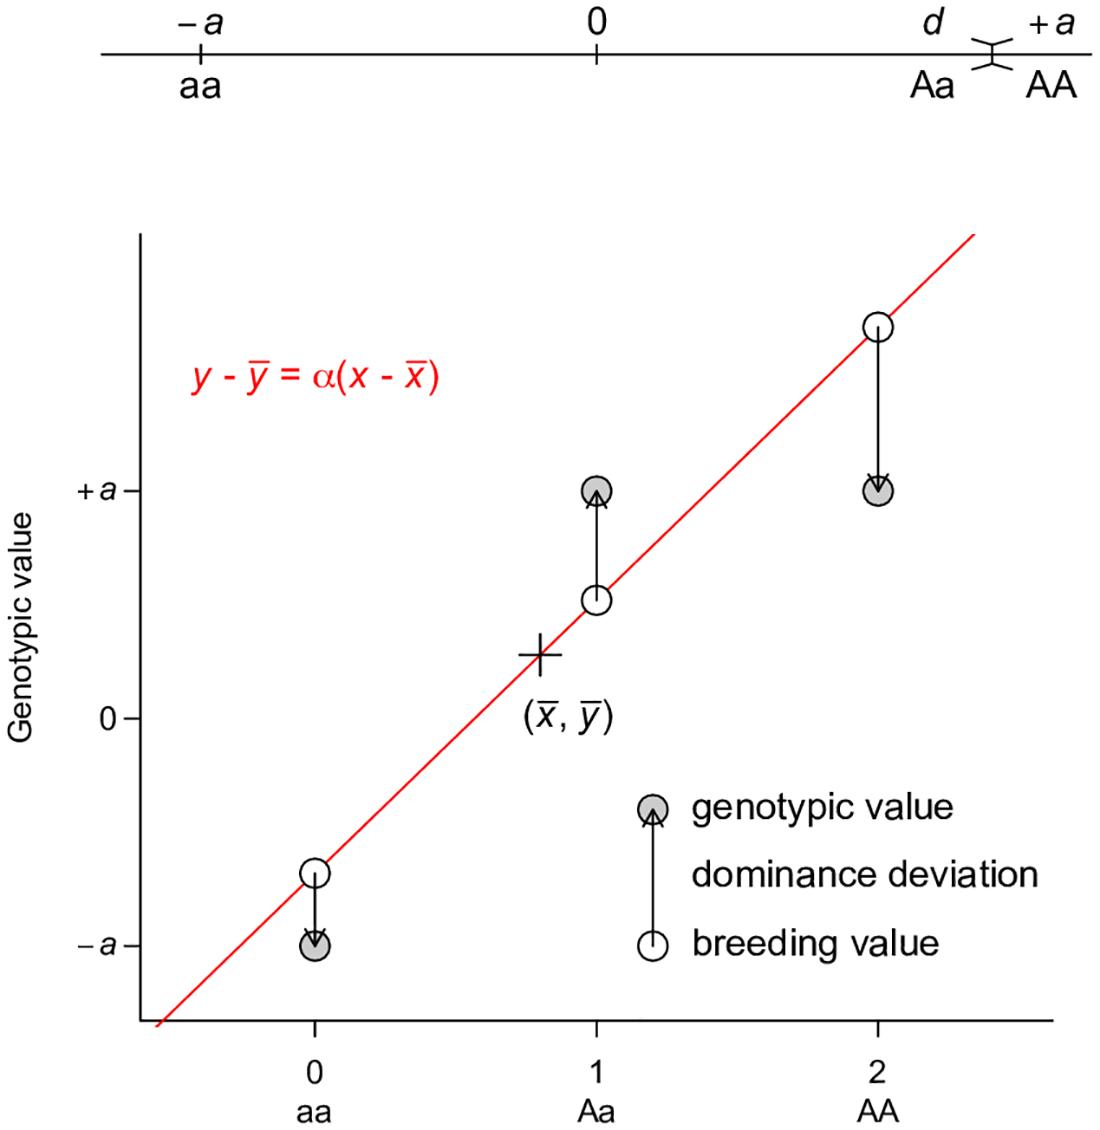 Least squares regression interpretation of <i>V</i><sub><i>A</i></sub>.